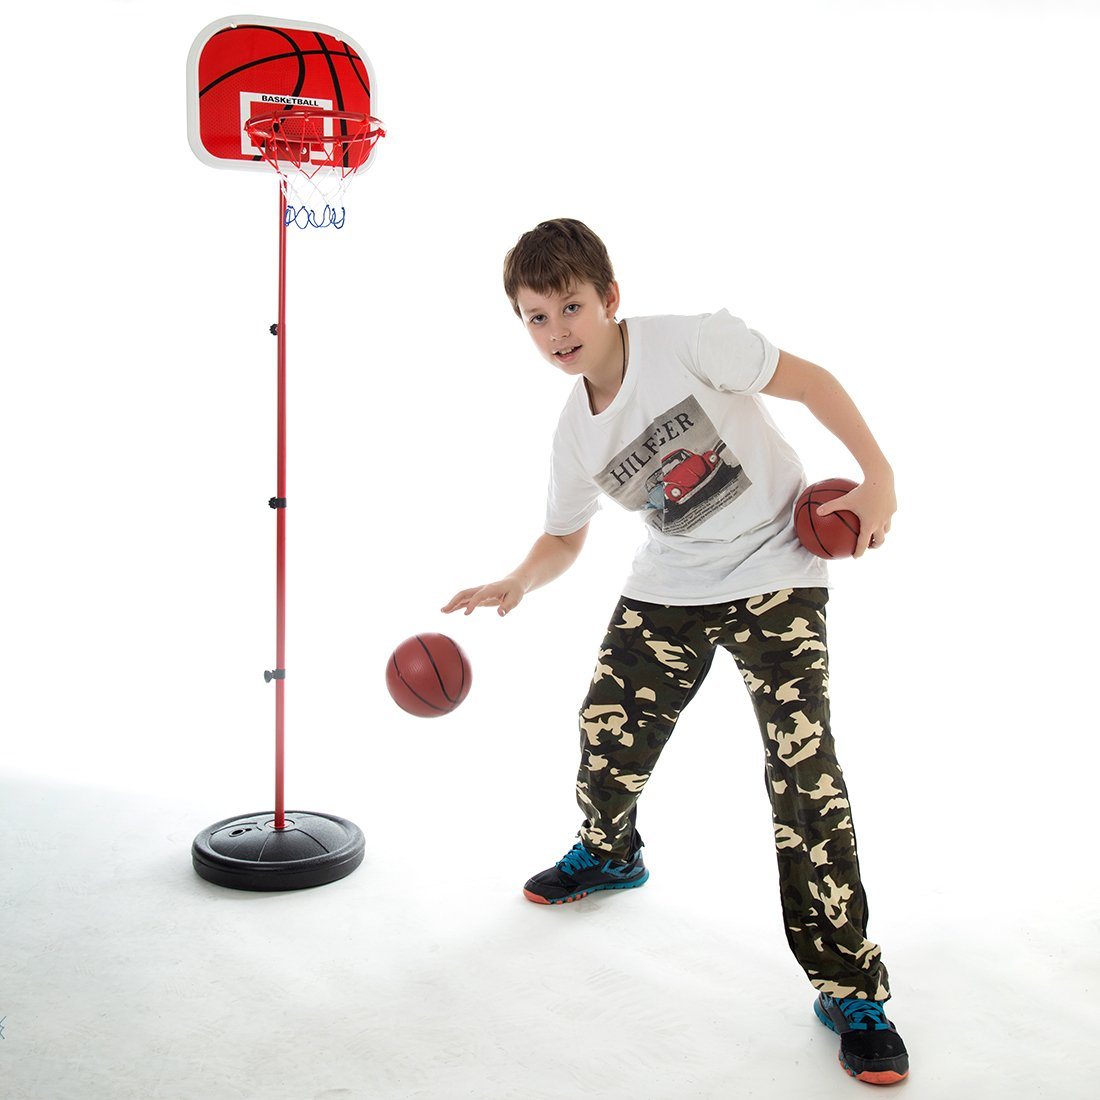 Yavso Canasta Baloncesto Infantil, 73-170cm Ajustable Aro de ...